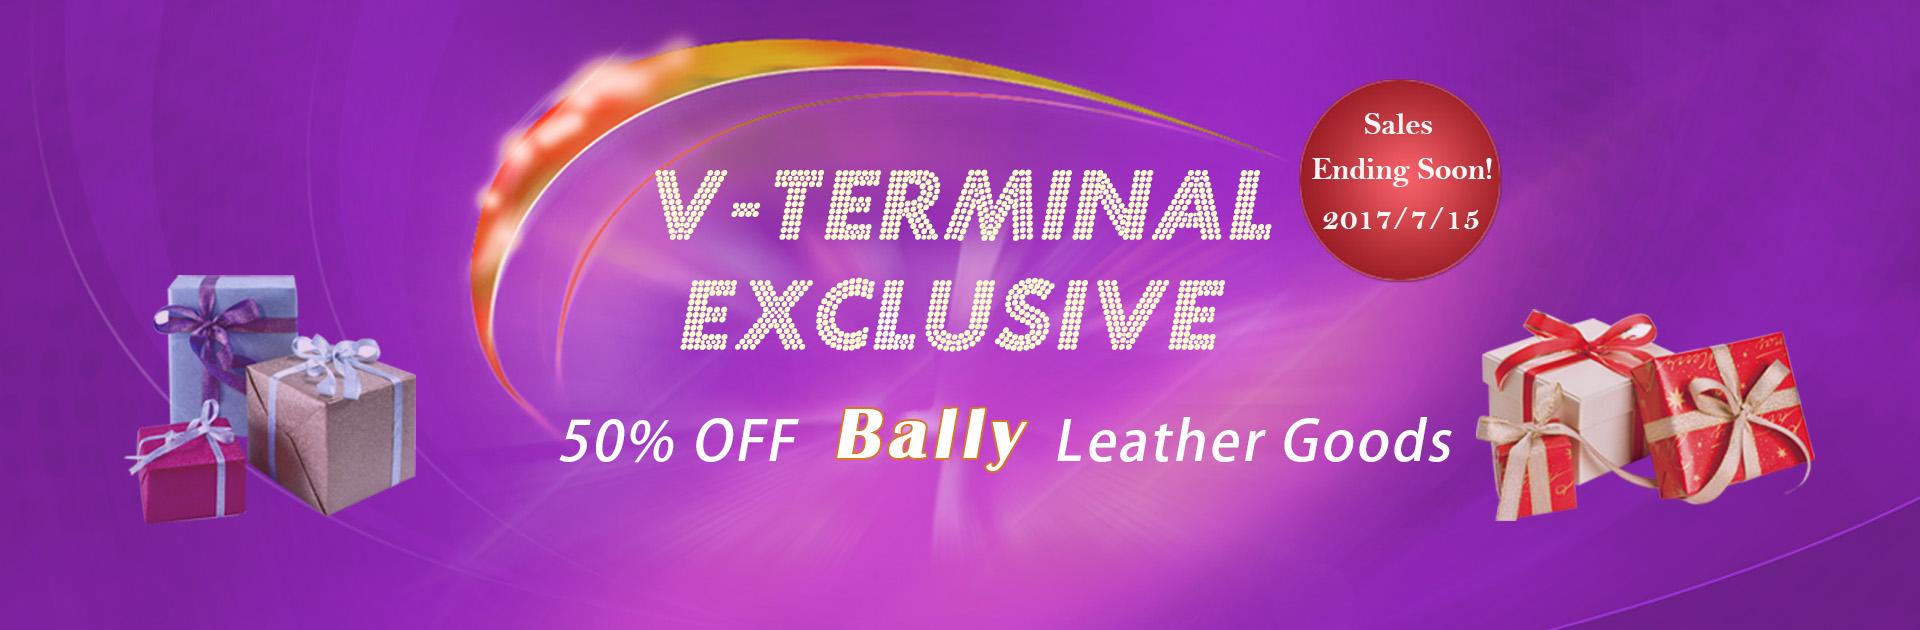 Sky Shilla Duty Free- Click to Shop